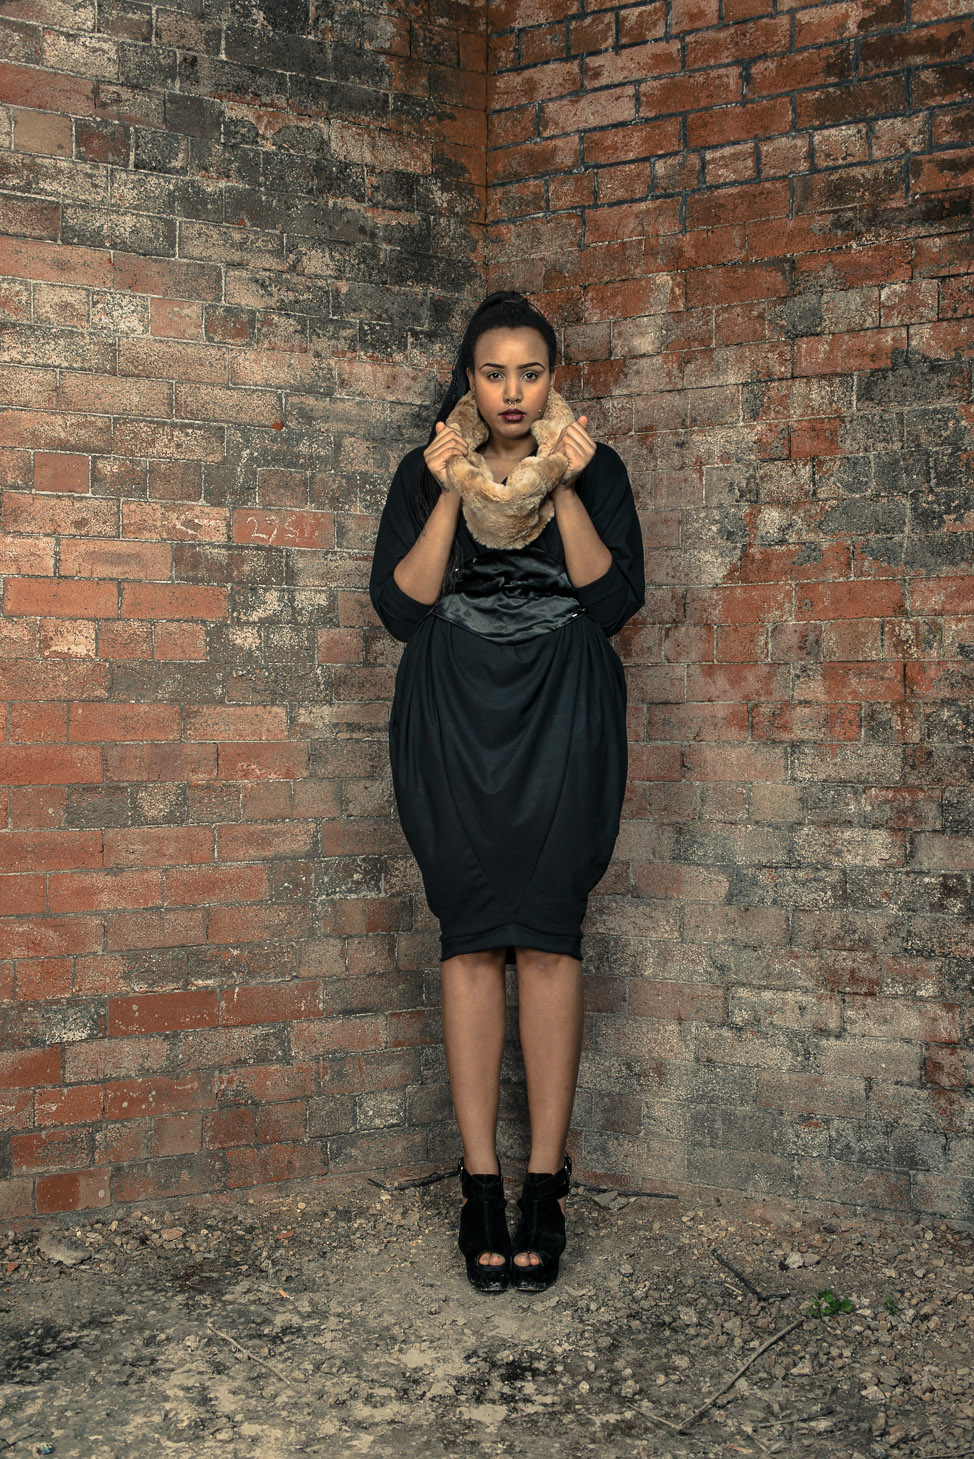 zaramia-ava-zaramiaava-leeds-fashion-designer-ethical-sustainable-tailored-minimalist-aya-dress-versatile-drape-black-belt-wrap-cowl-faux-fur-snood-styling-womenswear-models-photoshoot-location-18